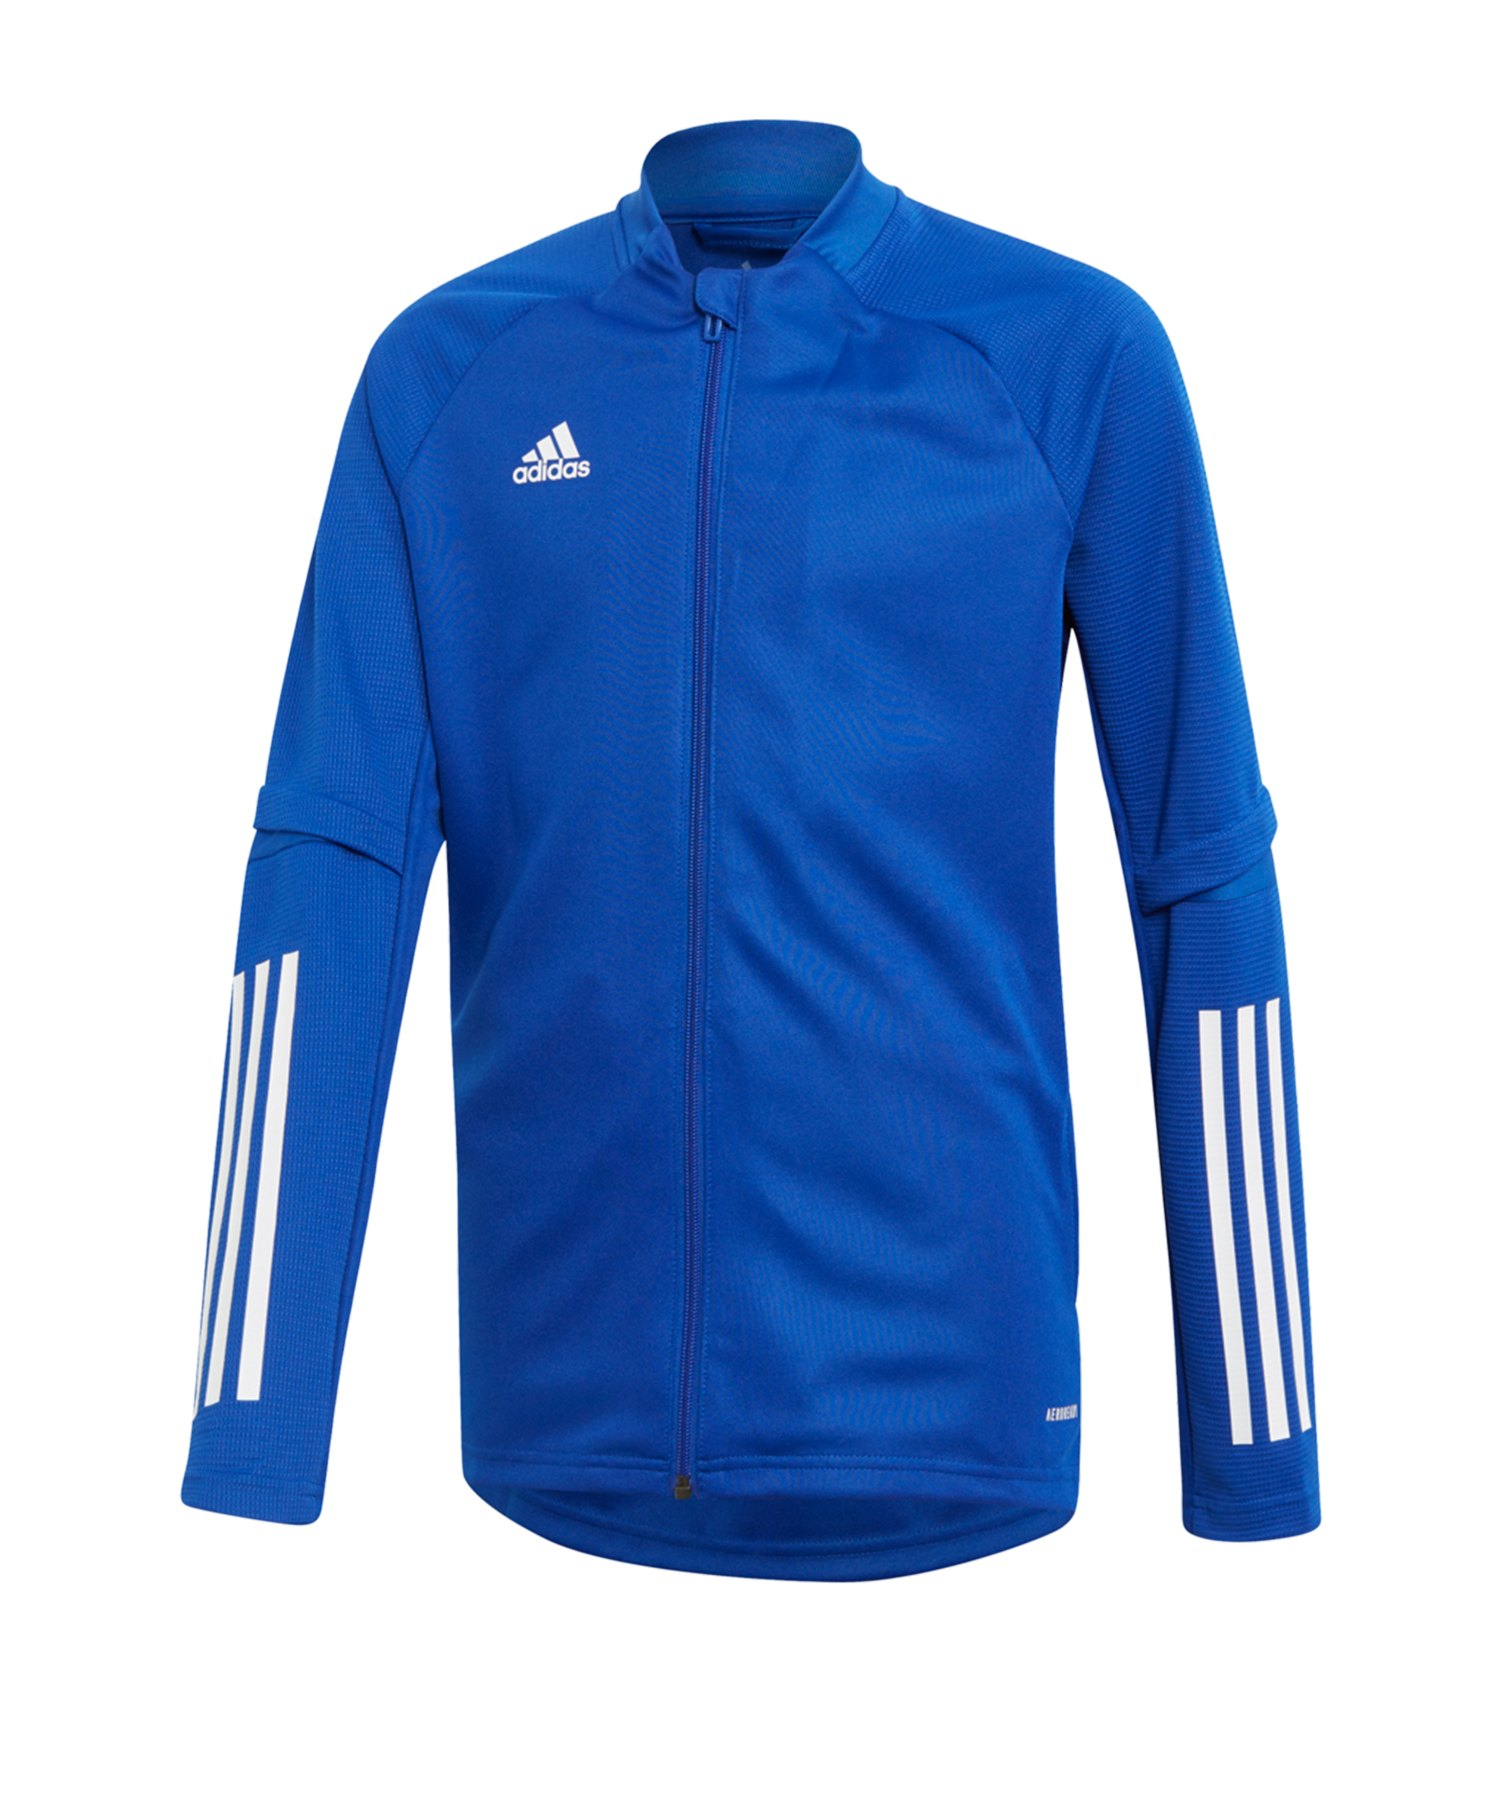 adidas Condivo 20 Trainingsjacke Kids Blau - blau